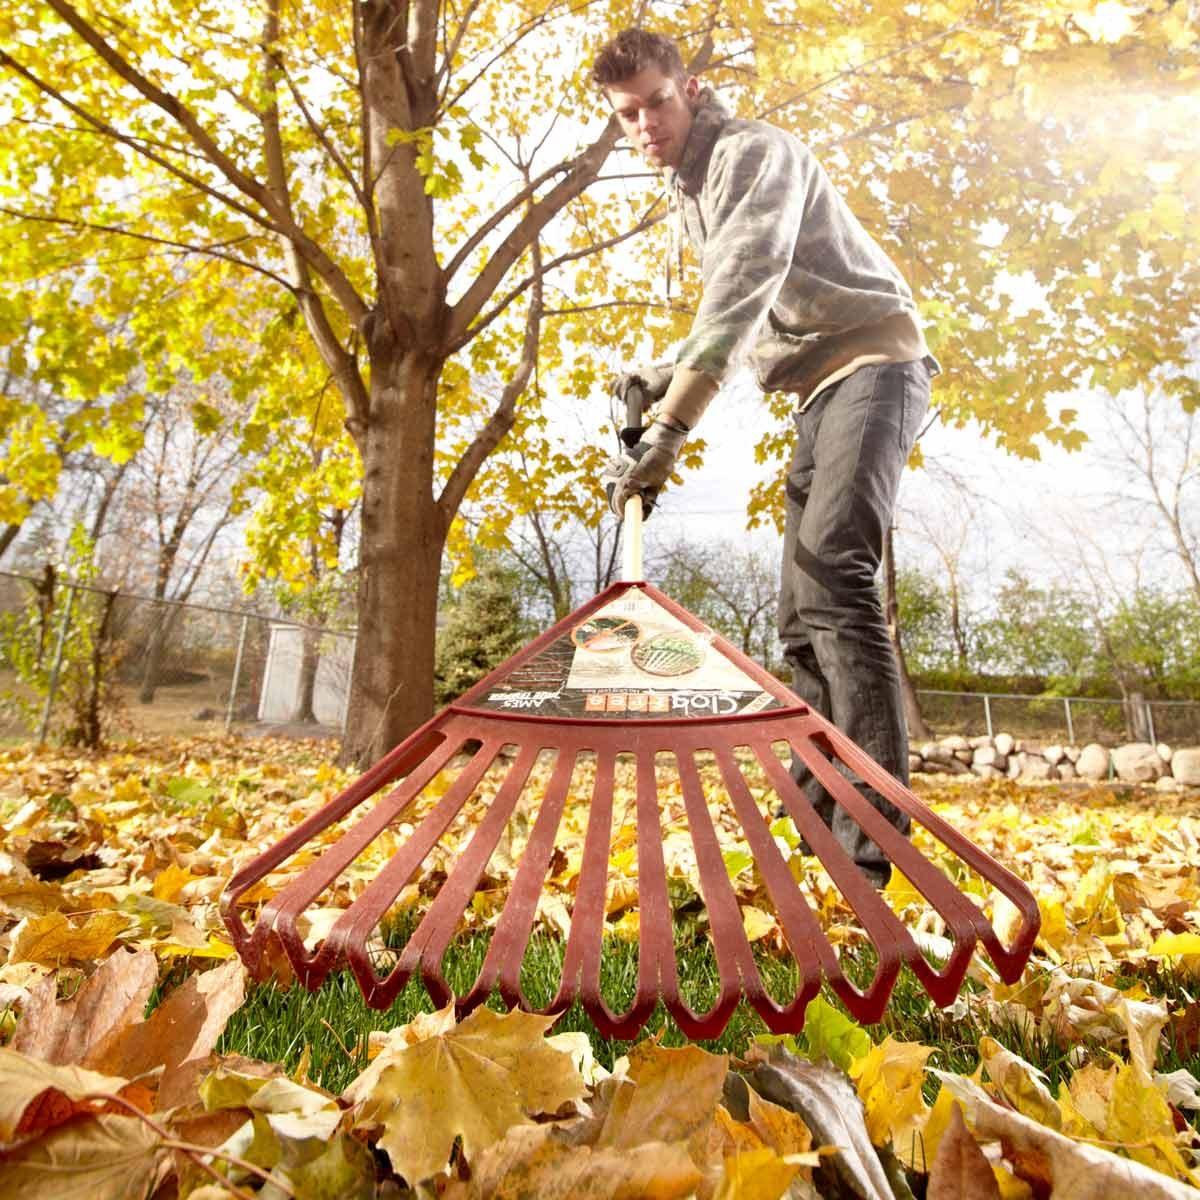 FH12OCT_532_58_039 rake raking fall leaves